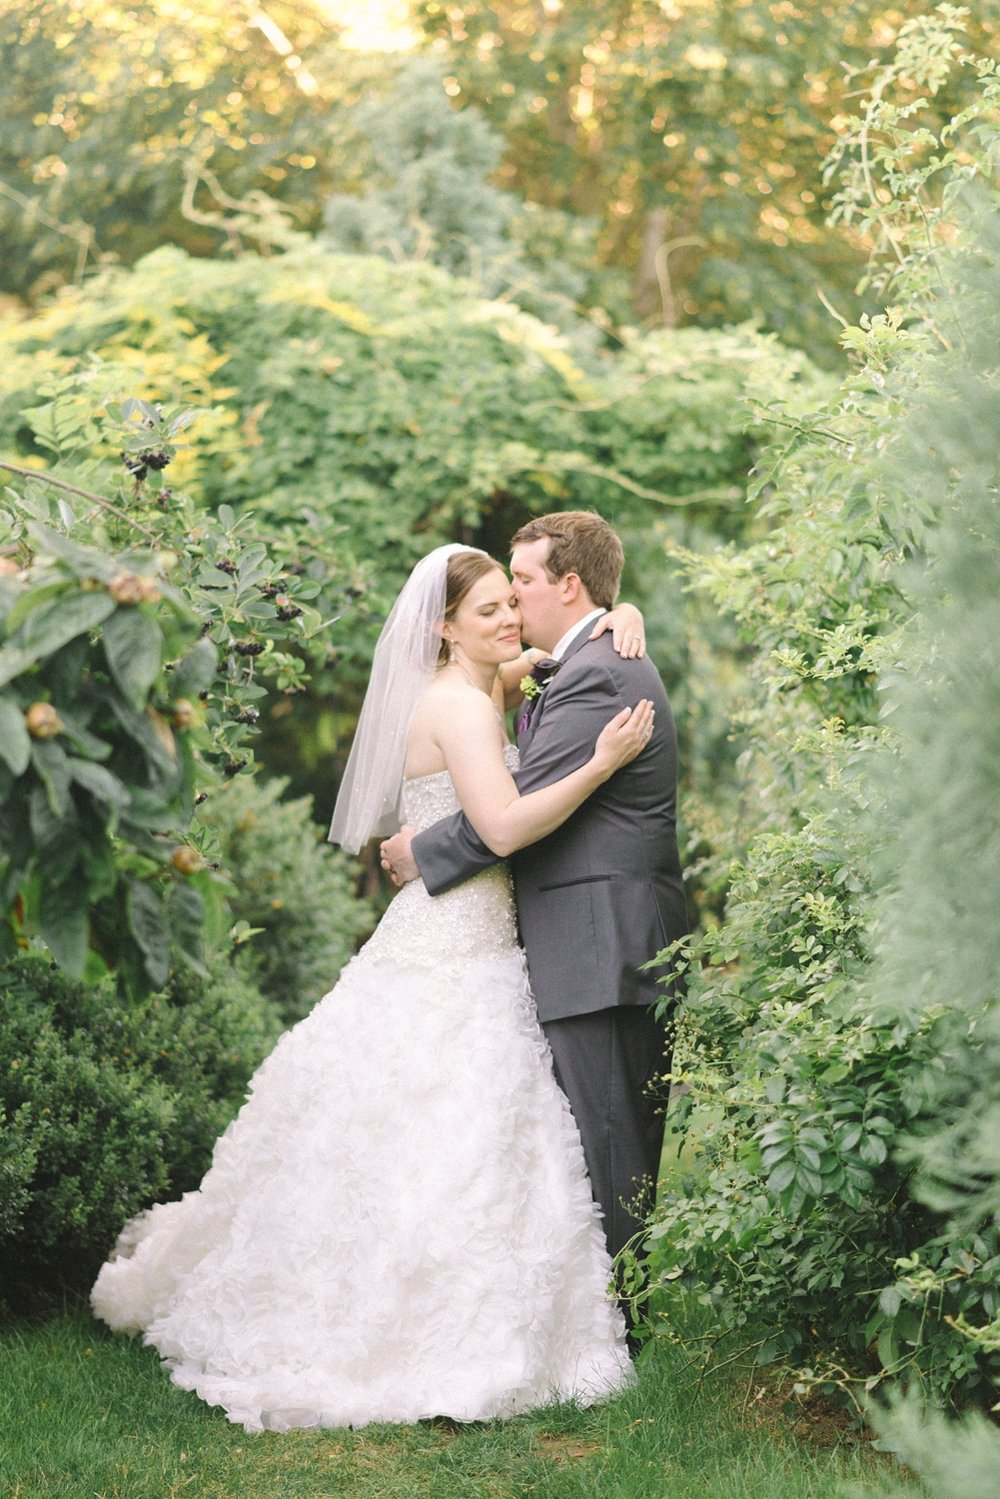 mcmenamins-edgefield-wedding-shelley-marie-photo-1.jpg